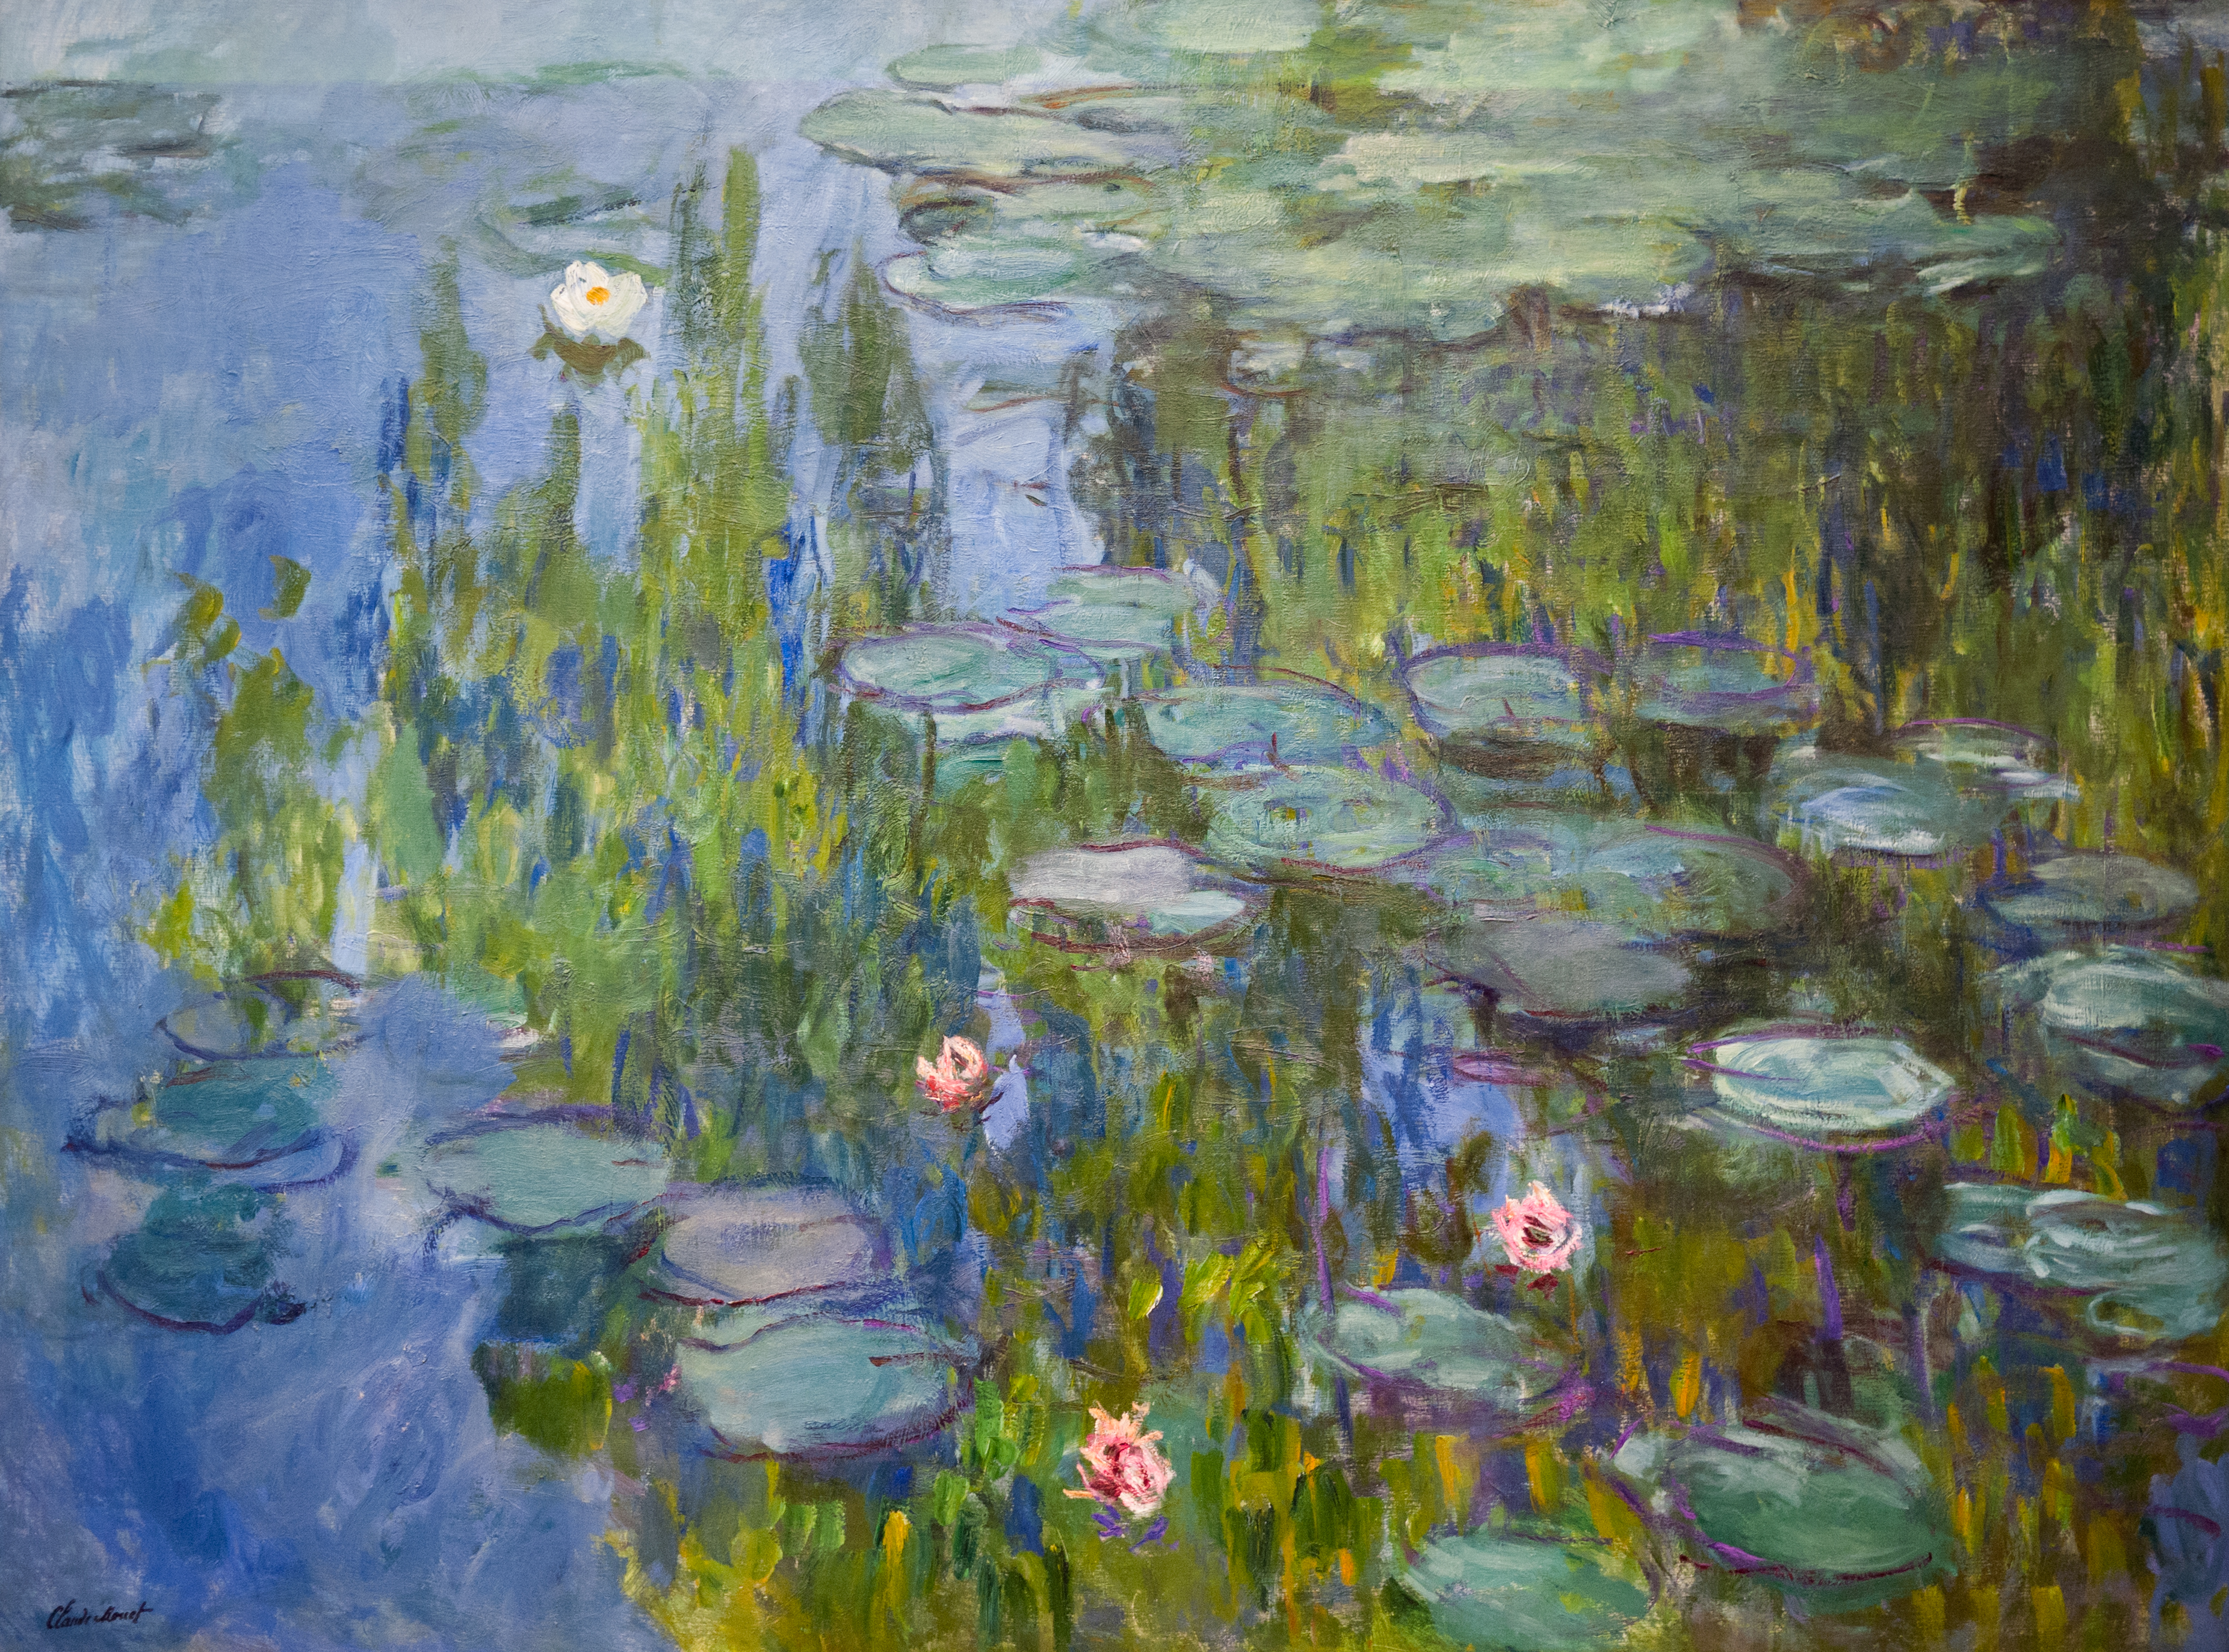 Seerosenteich Monet